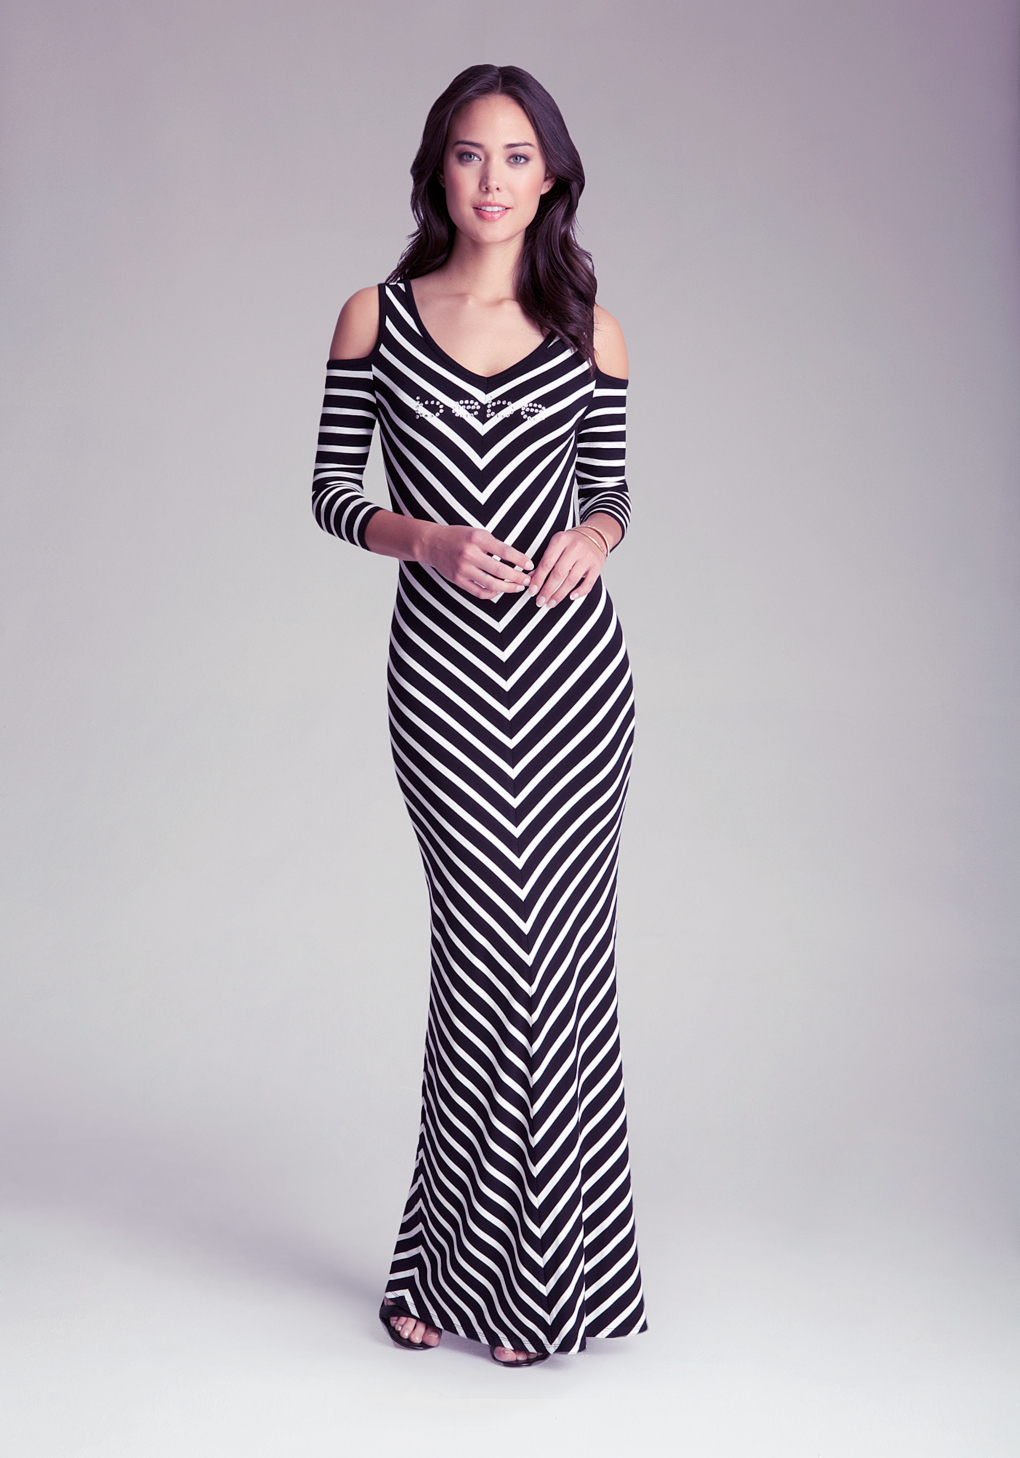 Bebe Cold Shoulder Chevron Dress in Black | Lyst